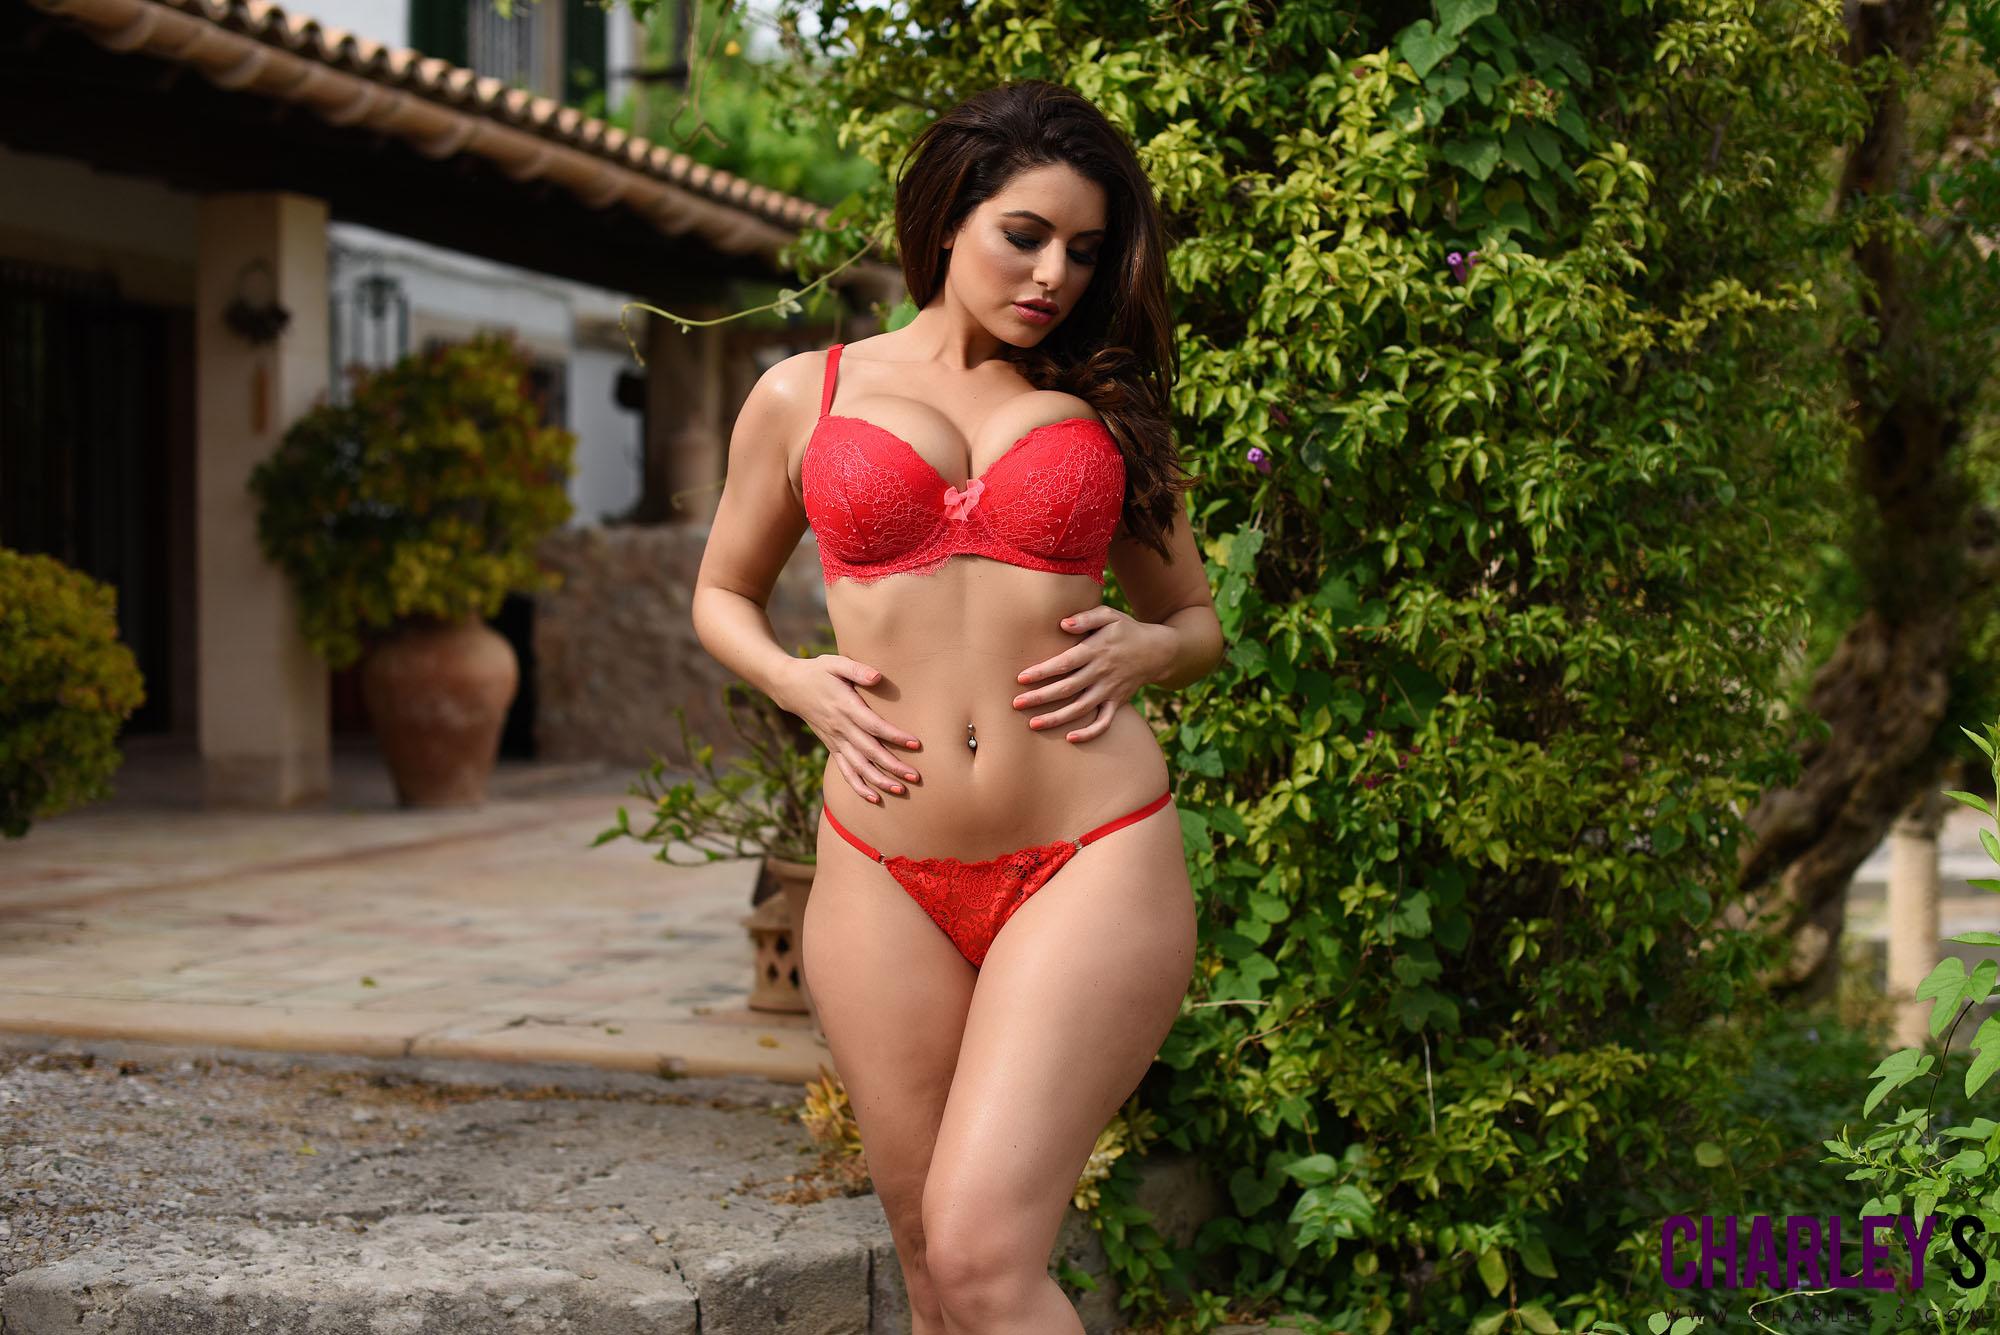 Charlotte Springer lady in red